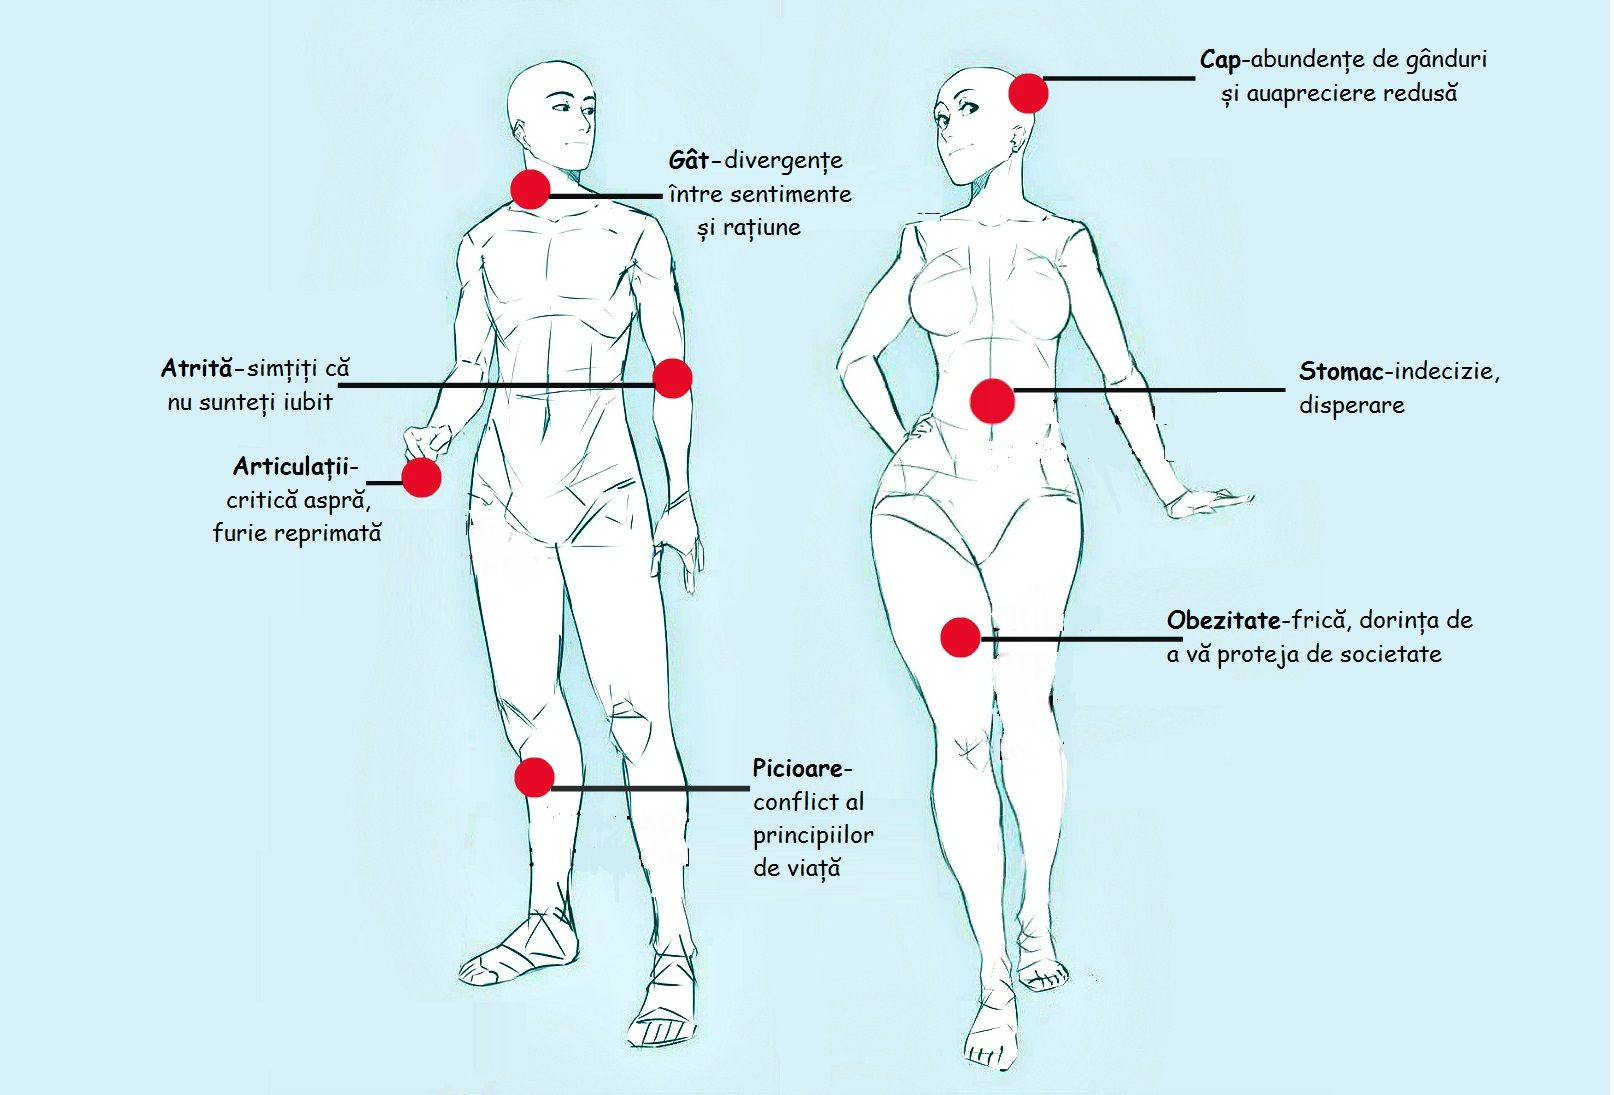 cauze psihosomatice ale bolii articulare